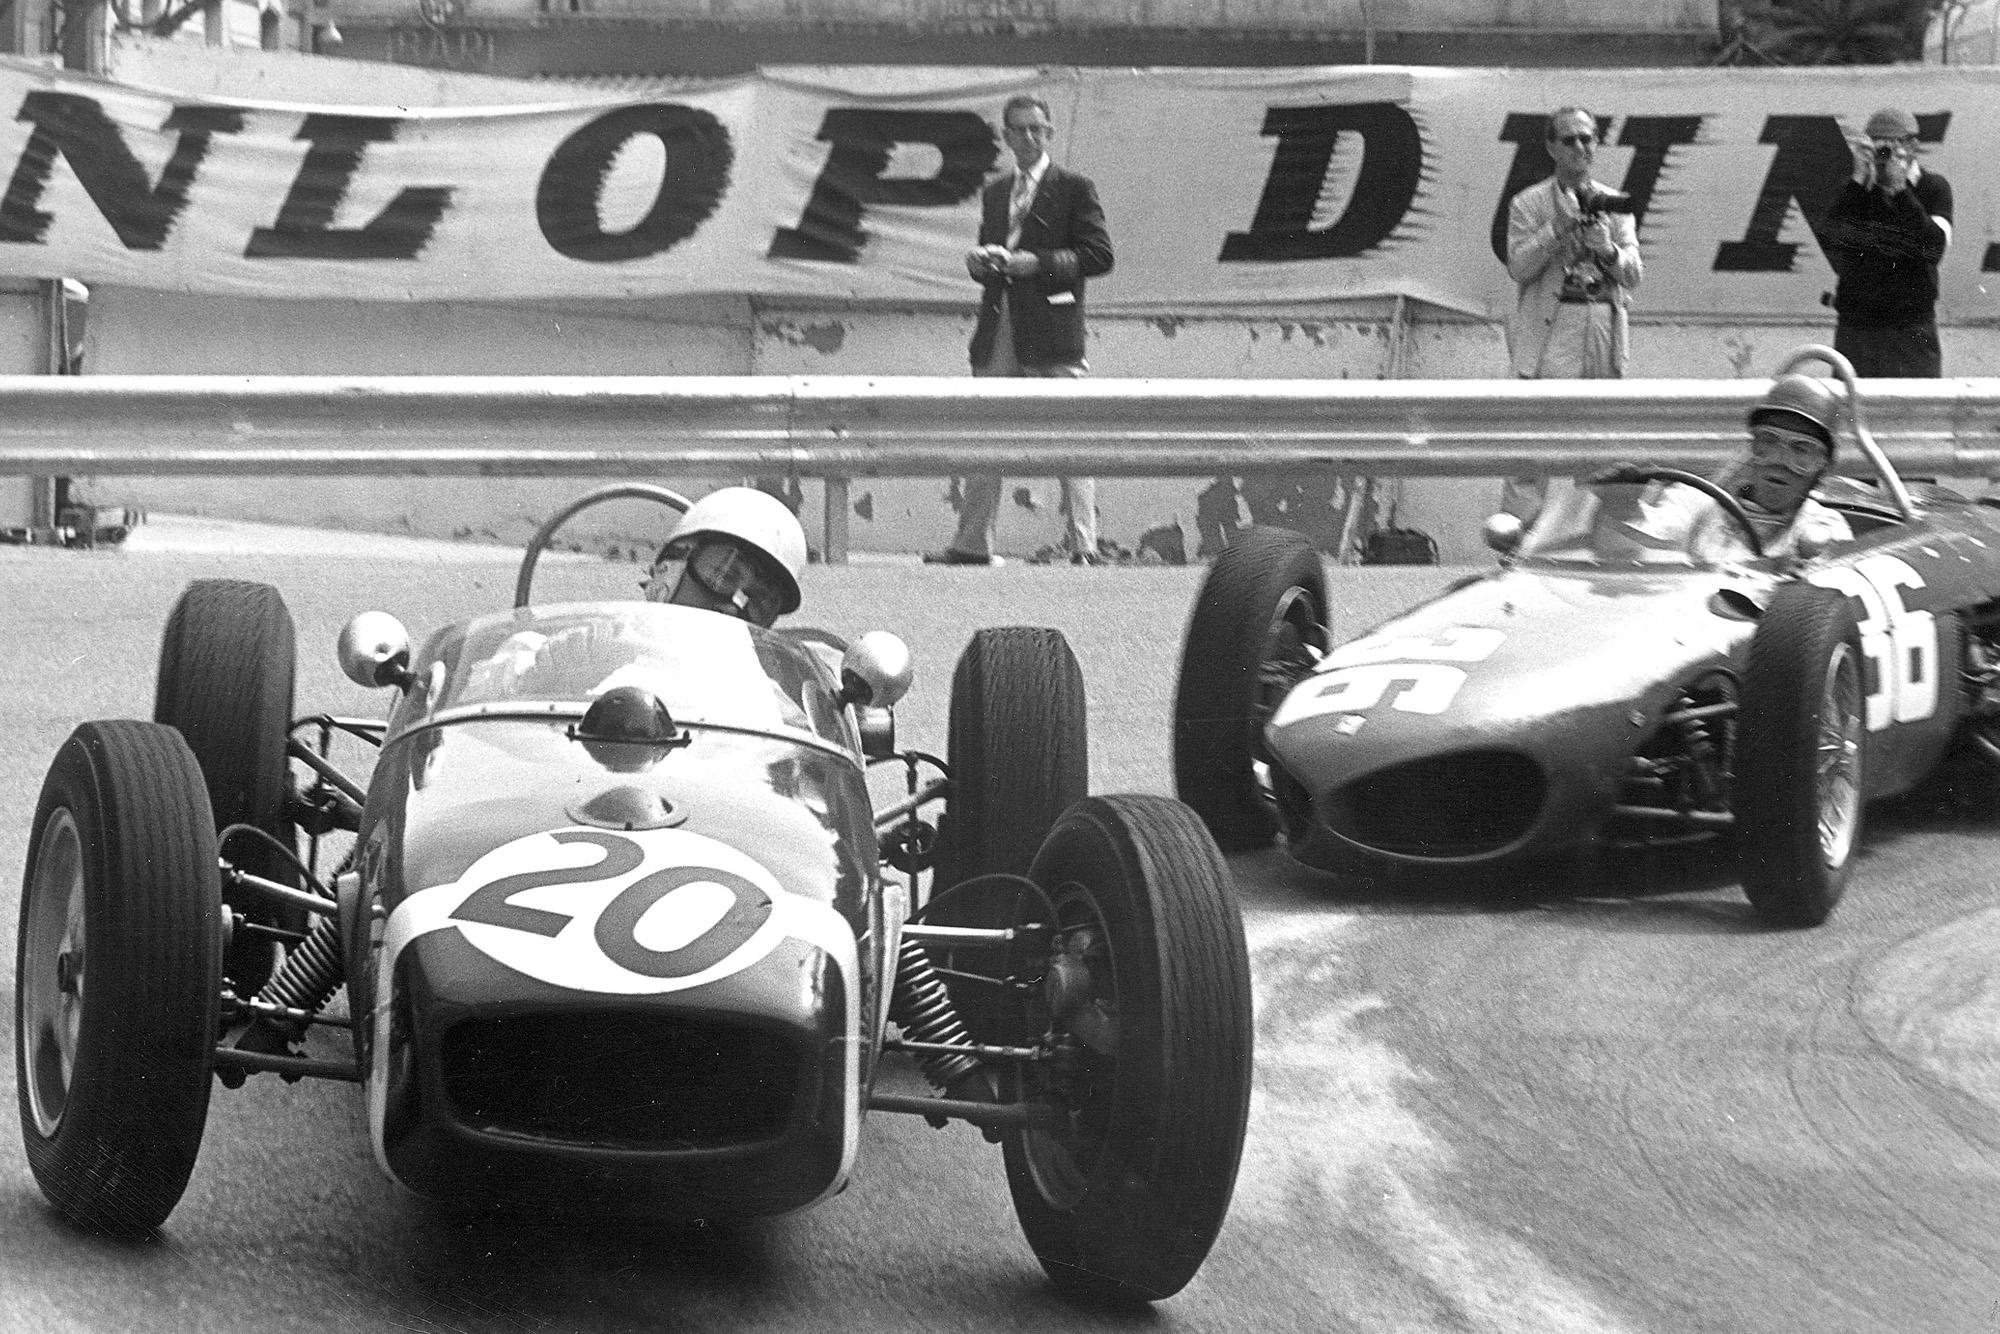 Stirling Moss leads a Ferrari during the 1961 Monaco Grand Prix